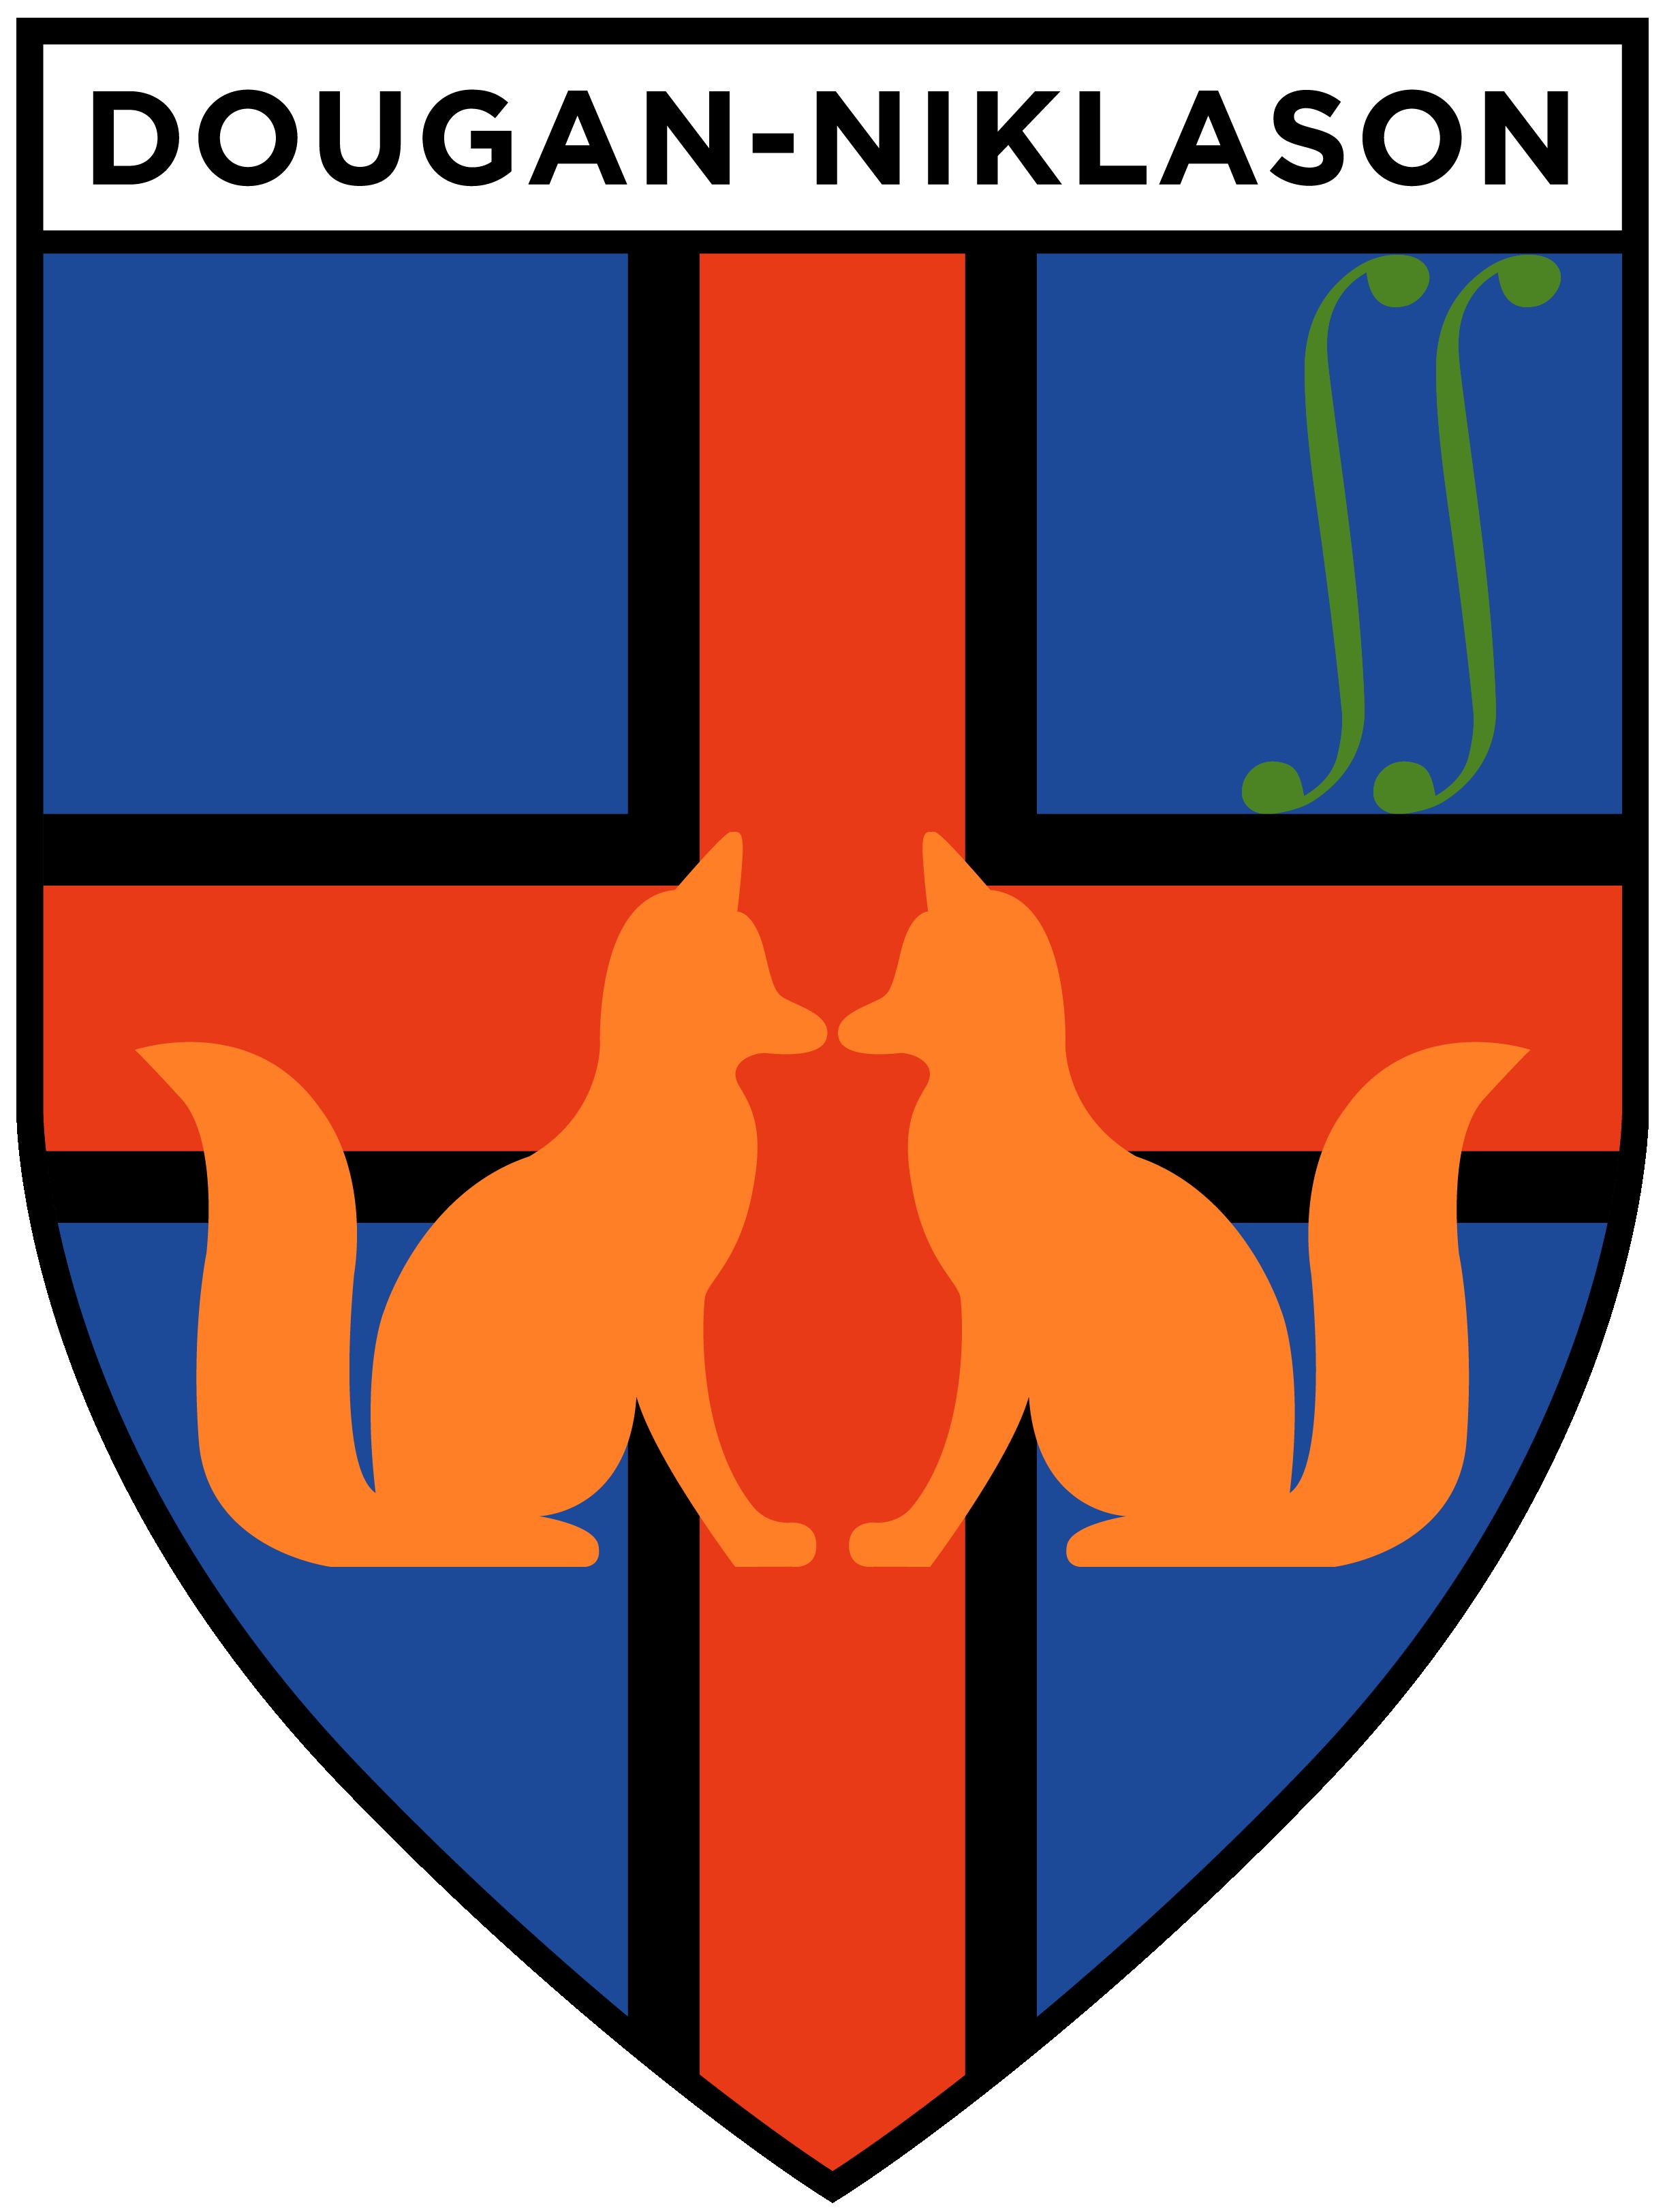 Dougan-Niklason House Shield